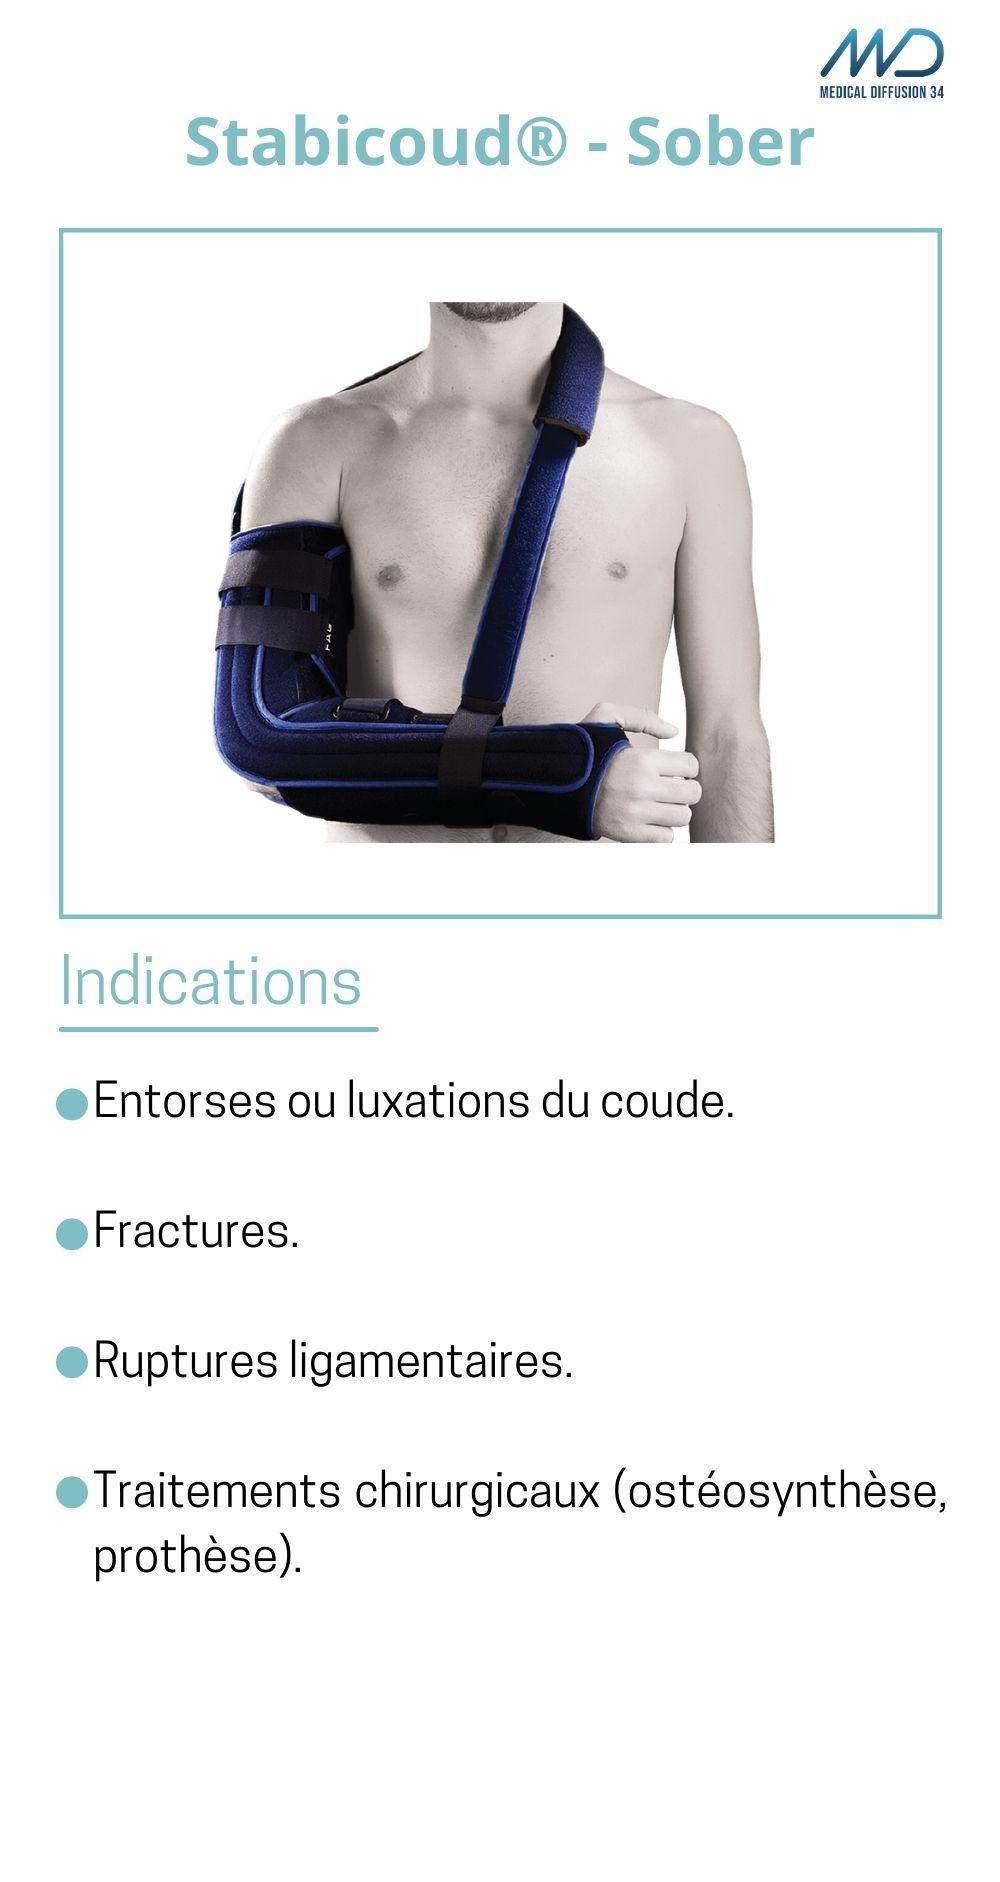 Stabicoud - Sober - orthèse de coude - espace md santé